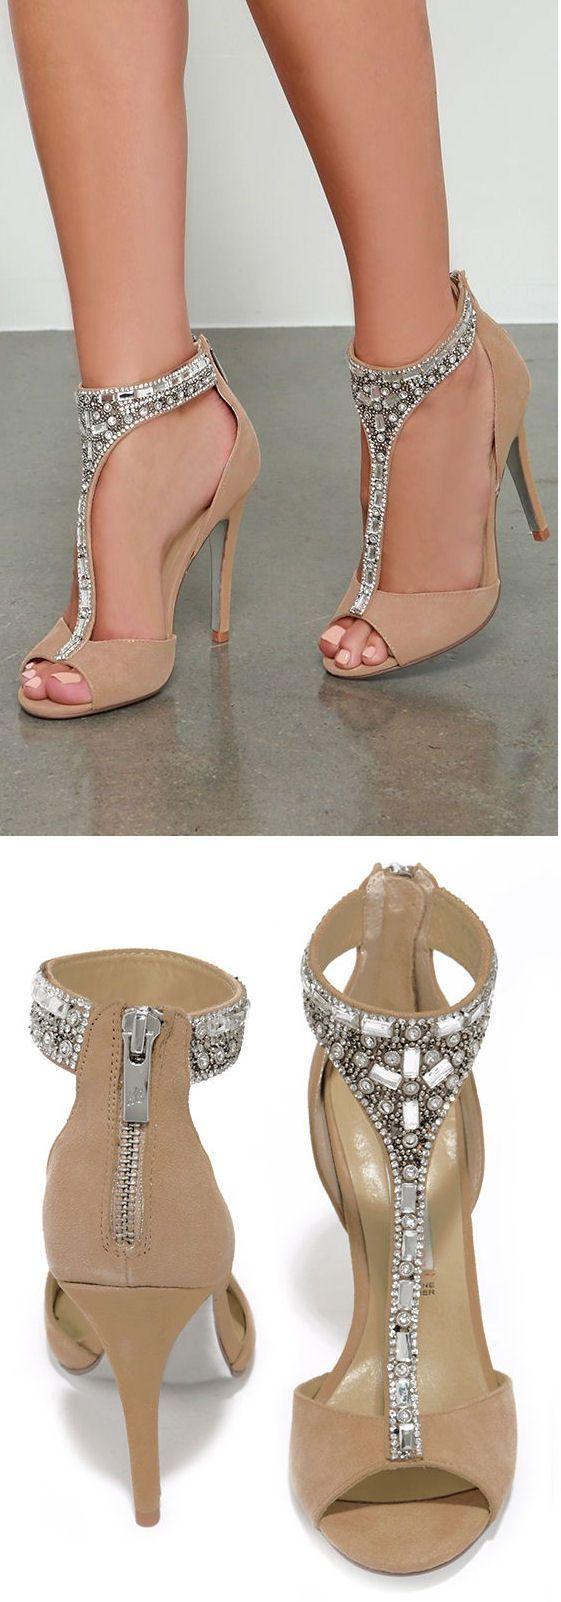 Nude Suede Bejeweled Heels ❤︎ #wedding #shoes #inspiration: